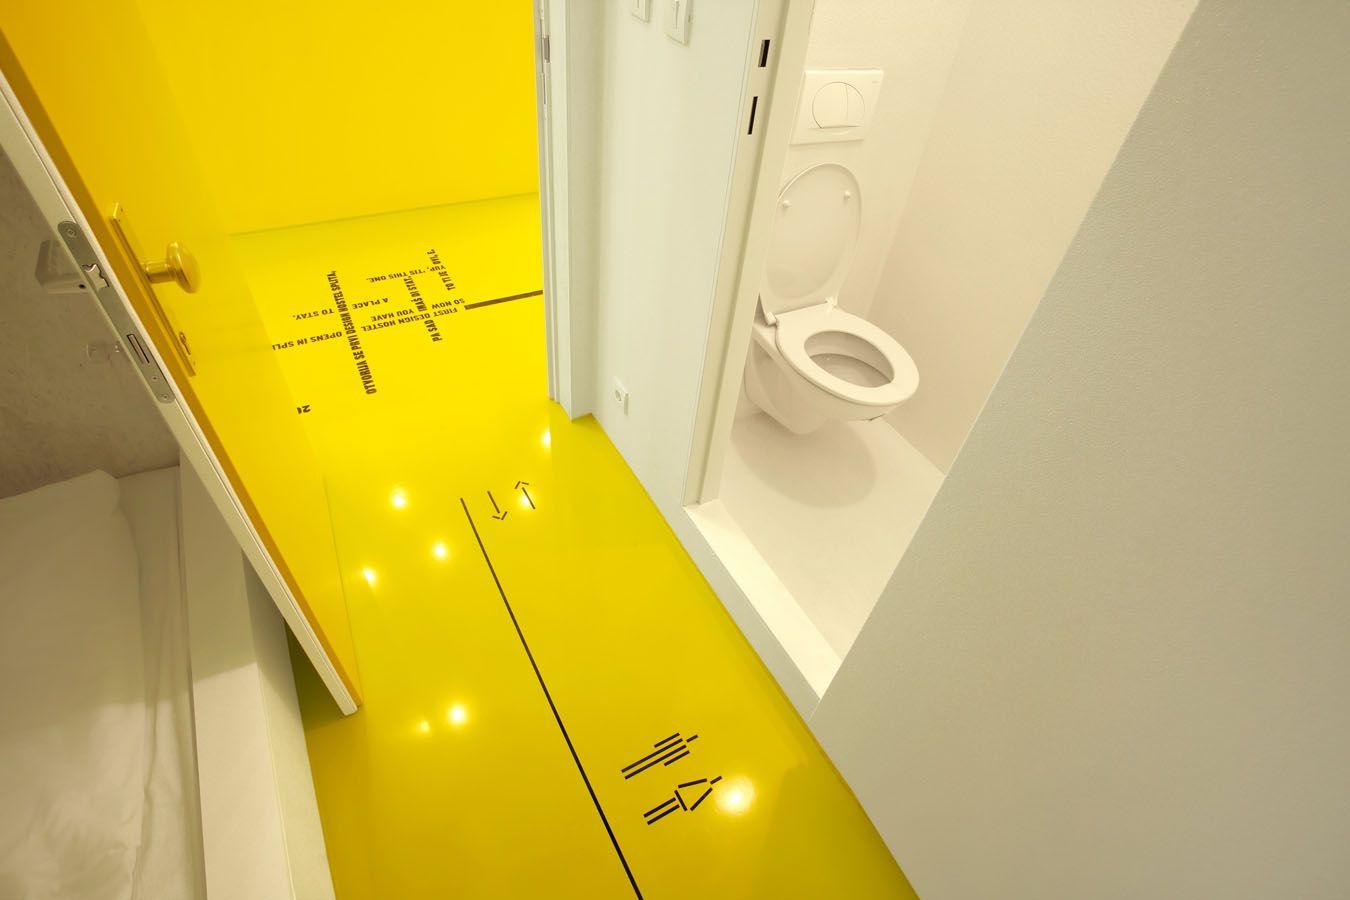 Yellow Bath Accessories Google Search Bathtime Fun with Harvey